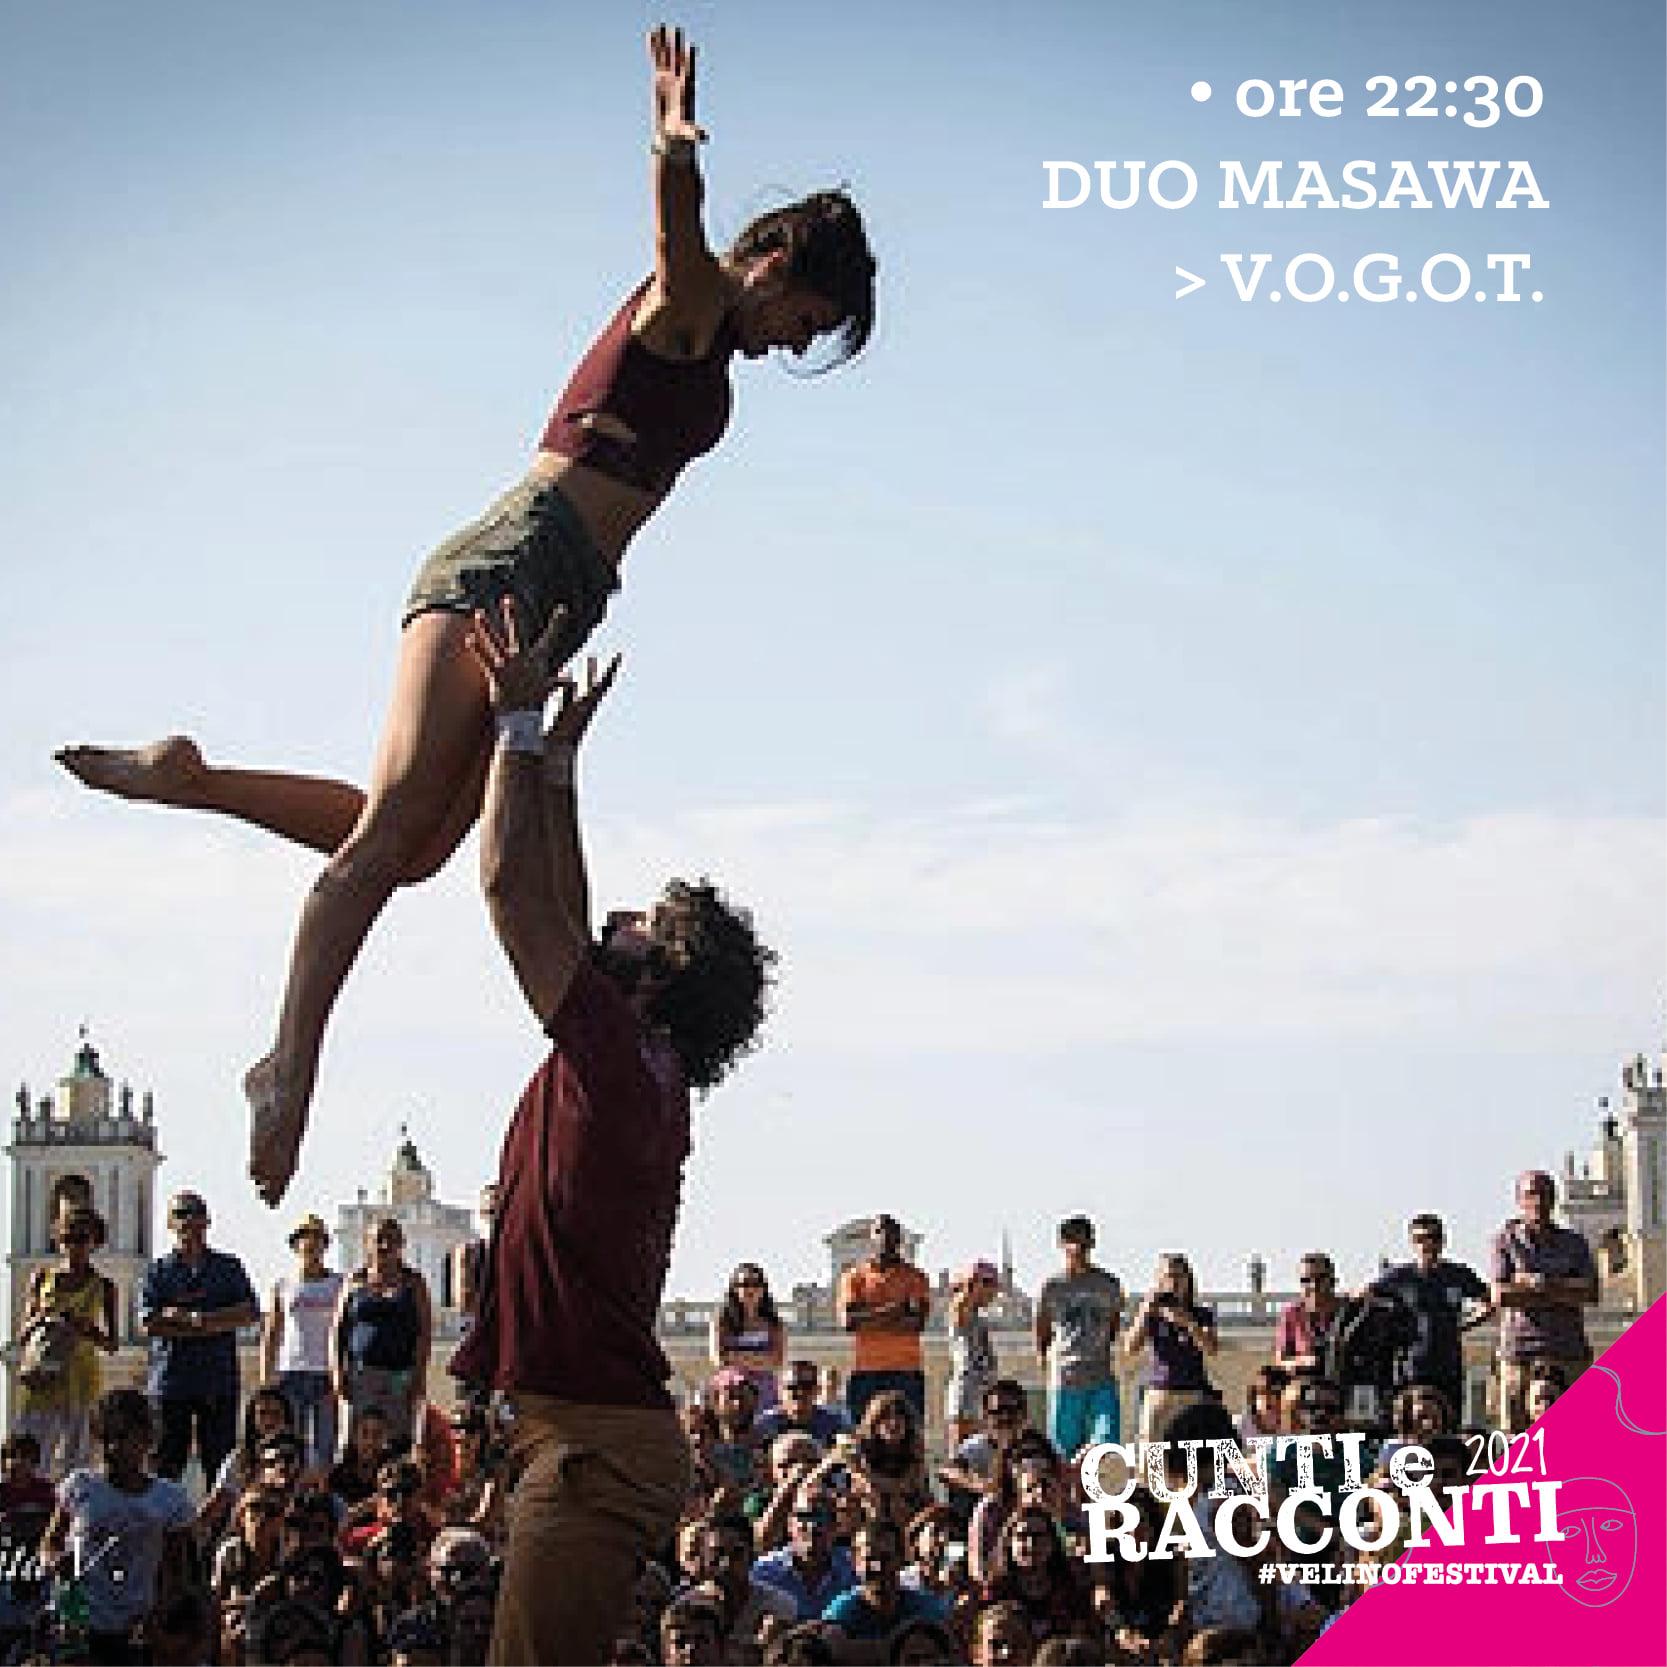 Cunti e Racconti Velino Festival / V.O.G.O.T.